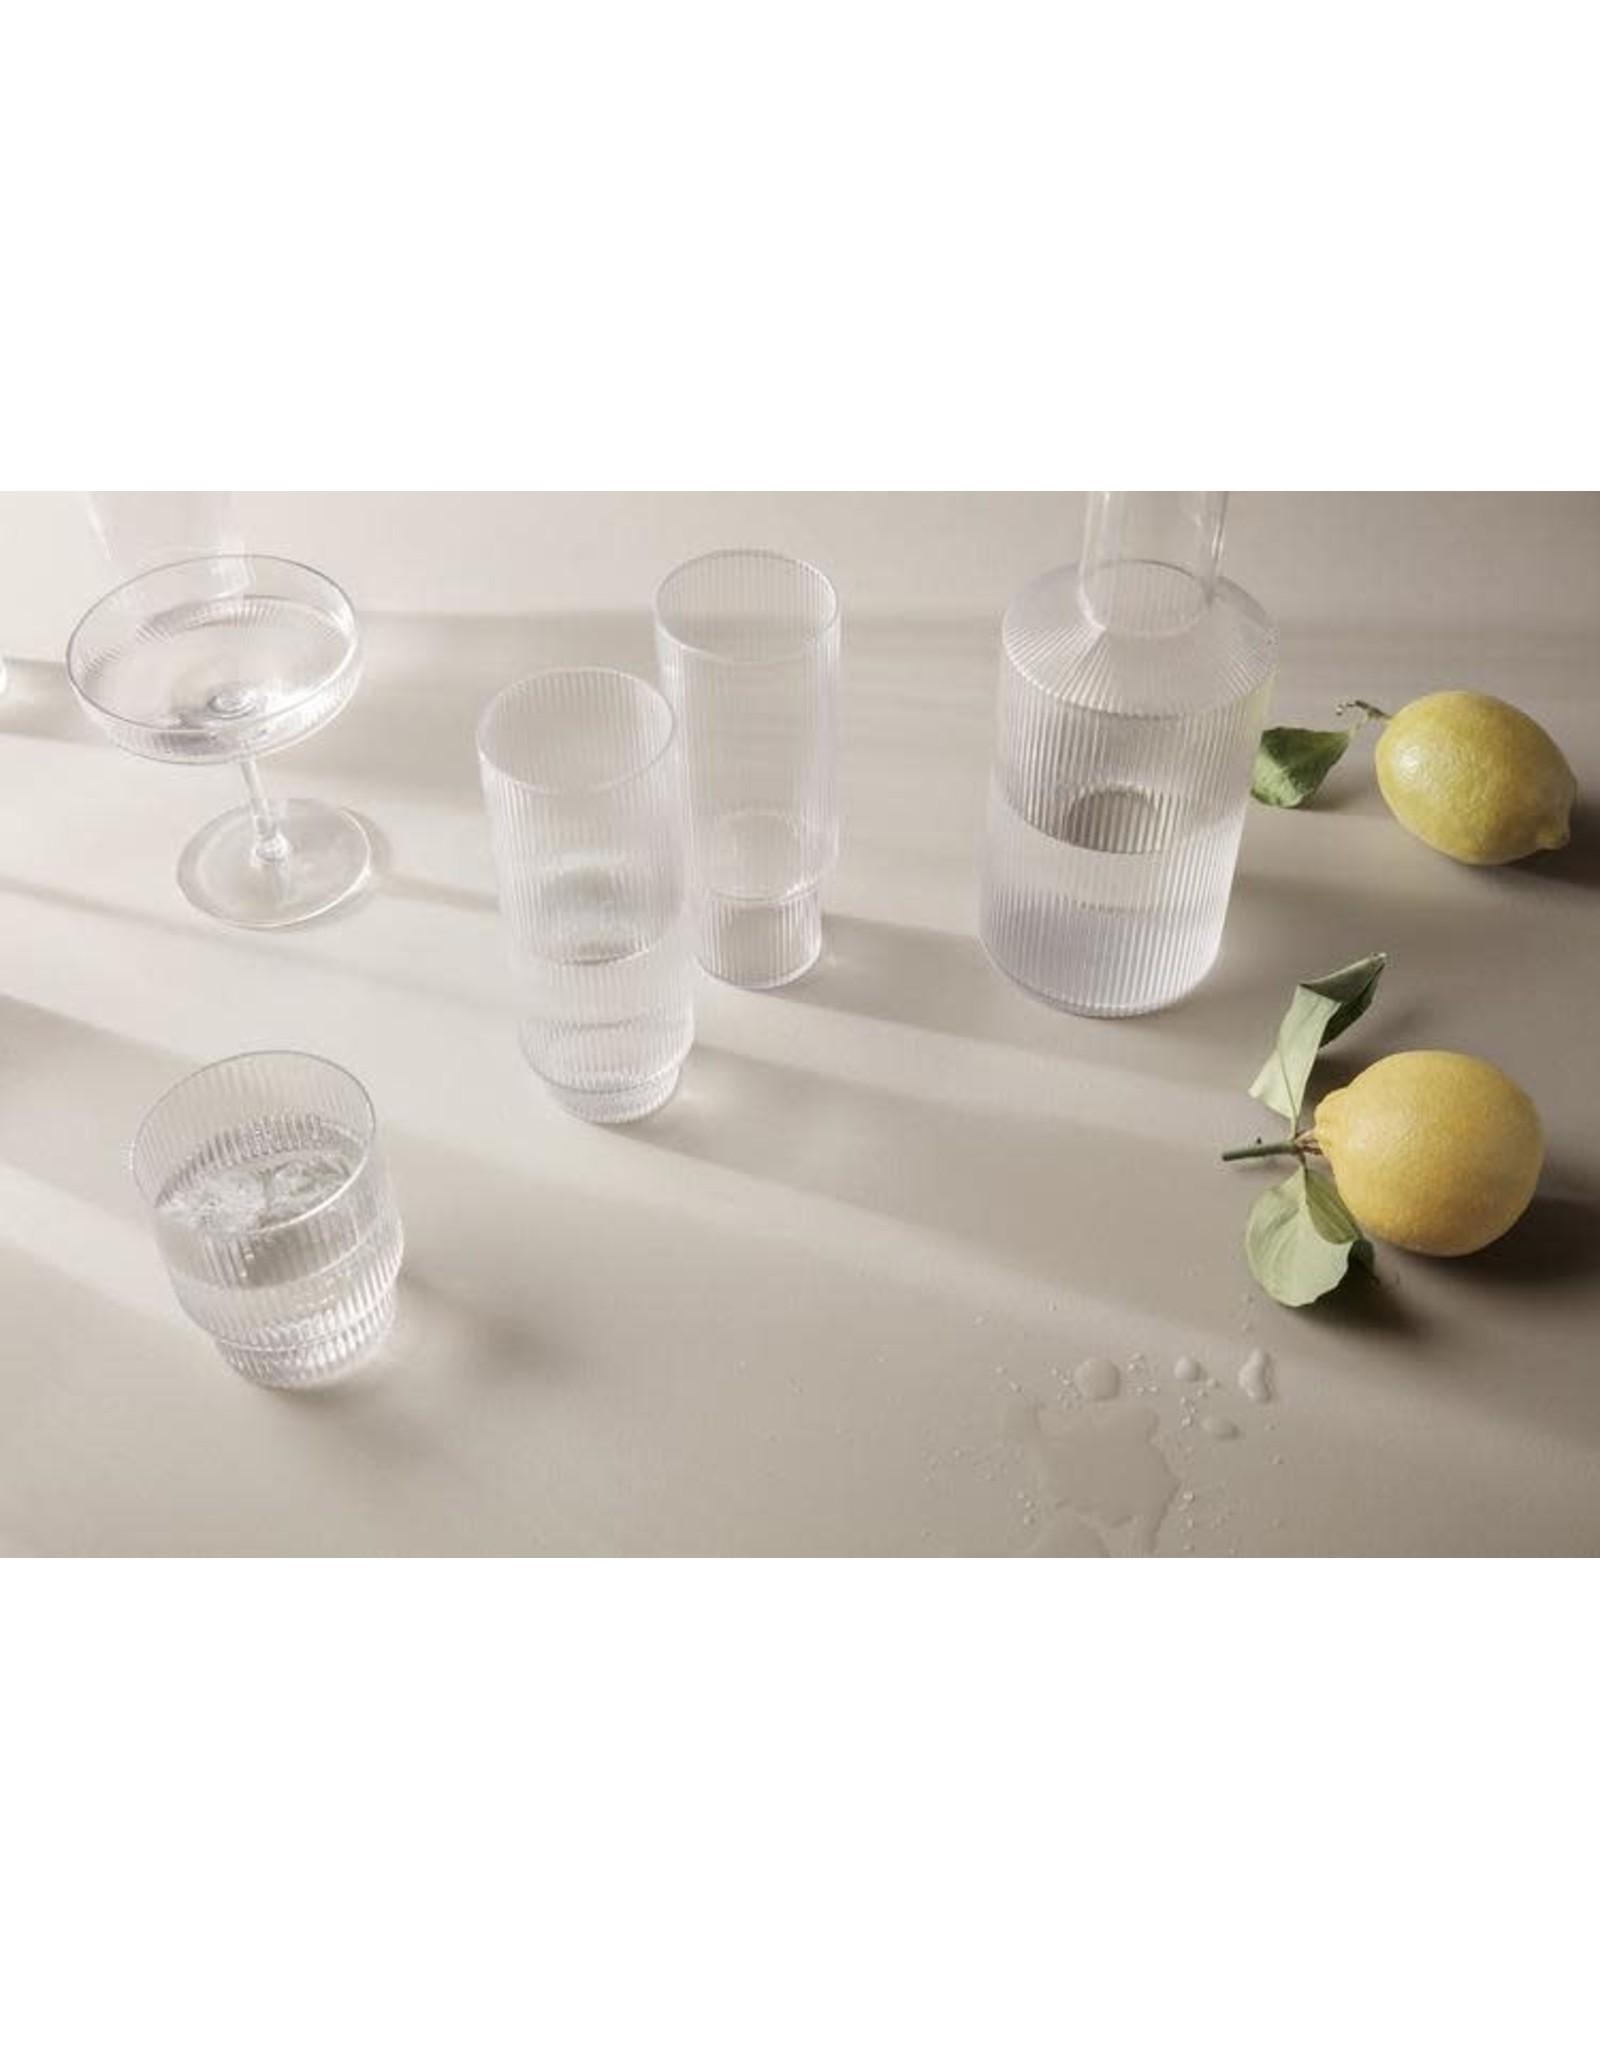 FERM LIVING Ripple Glasses (Set of 4) Clear